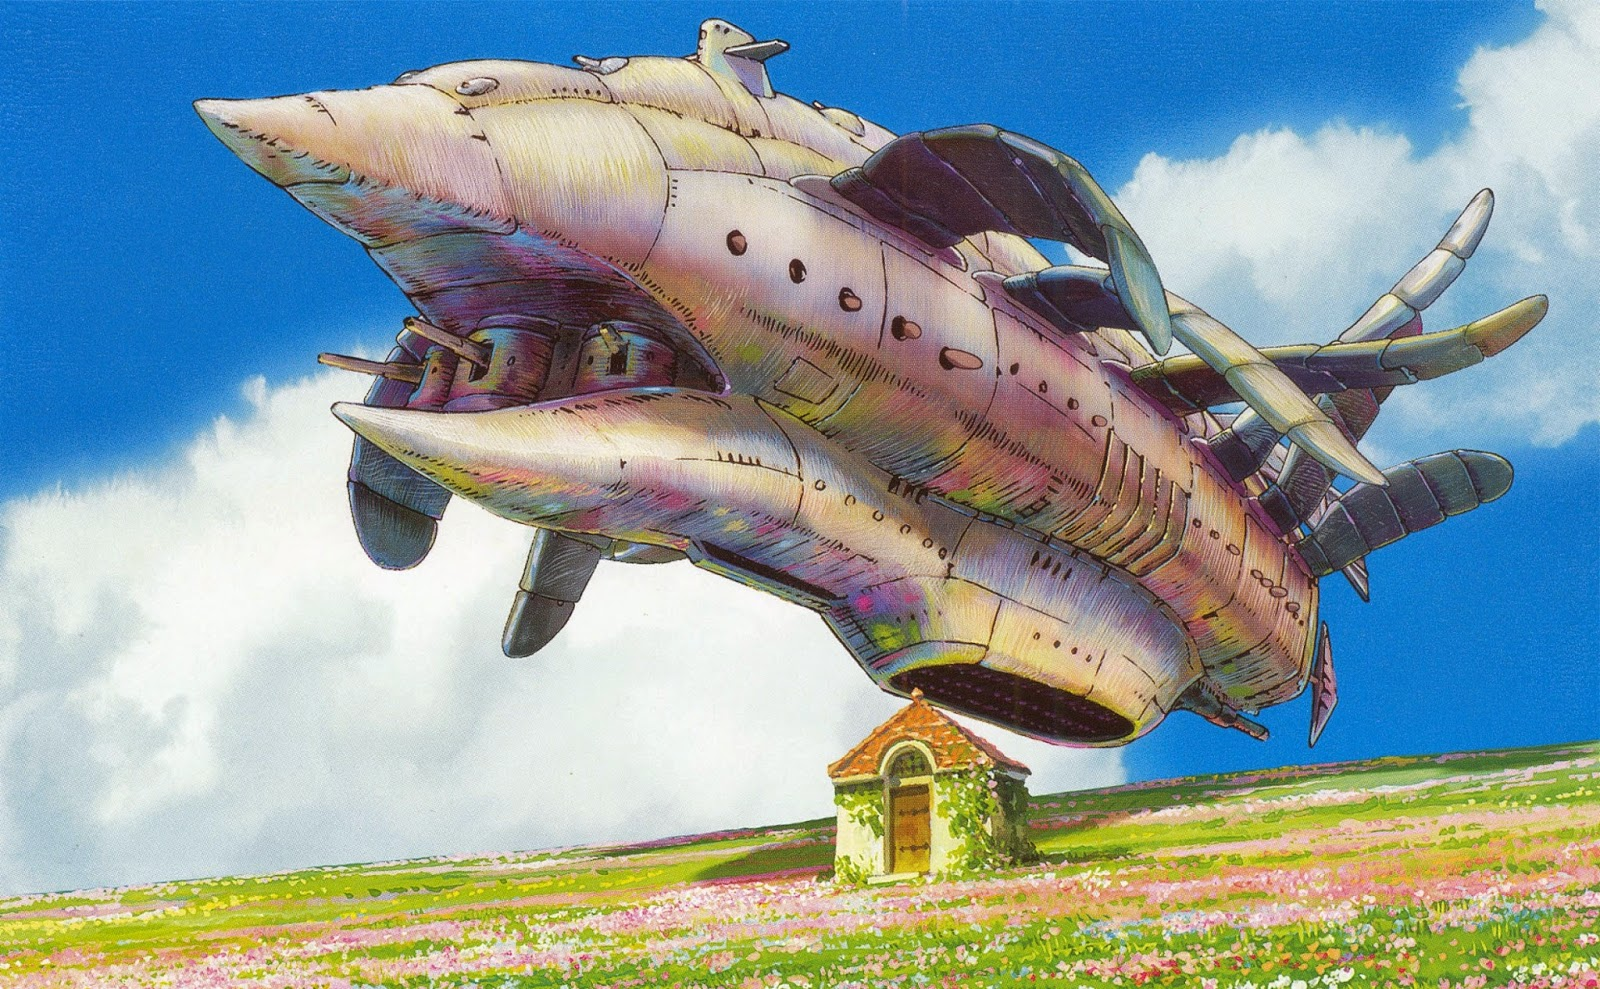 Drawn castle airplane #13